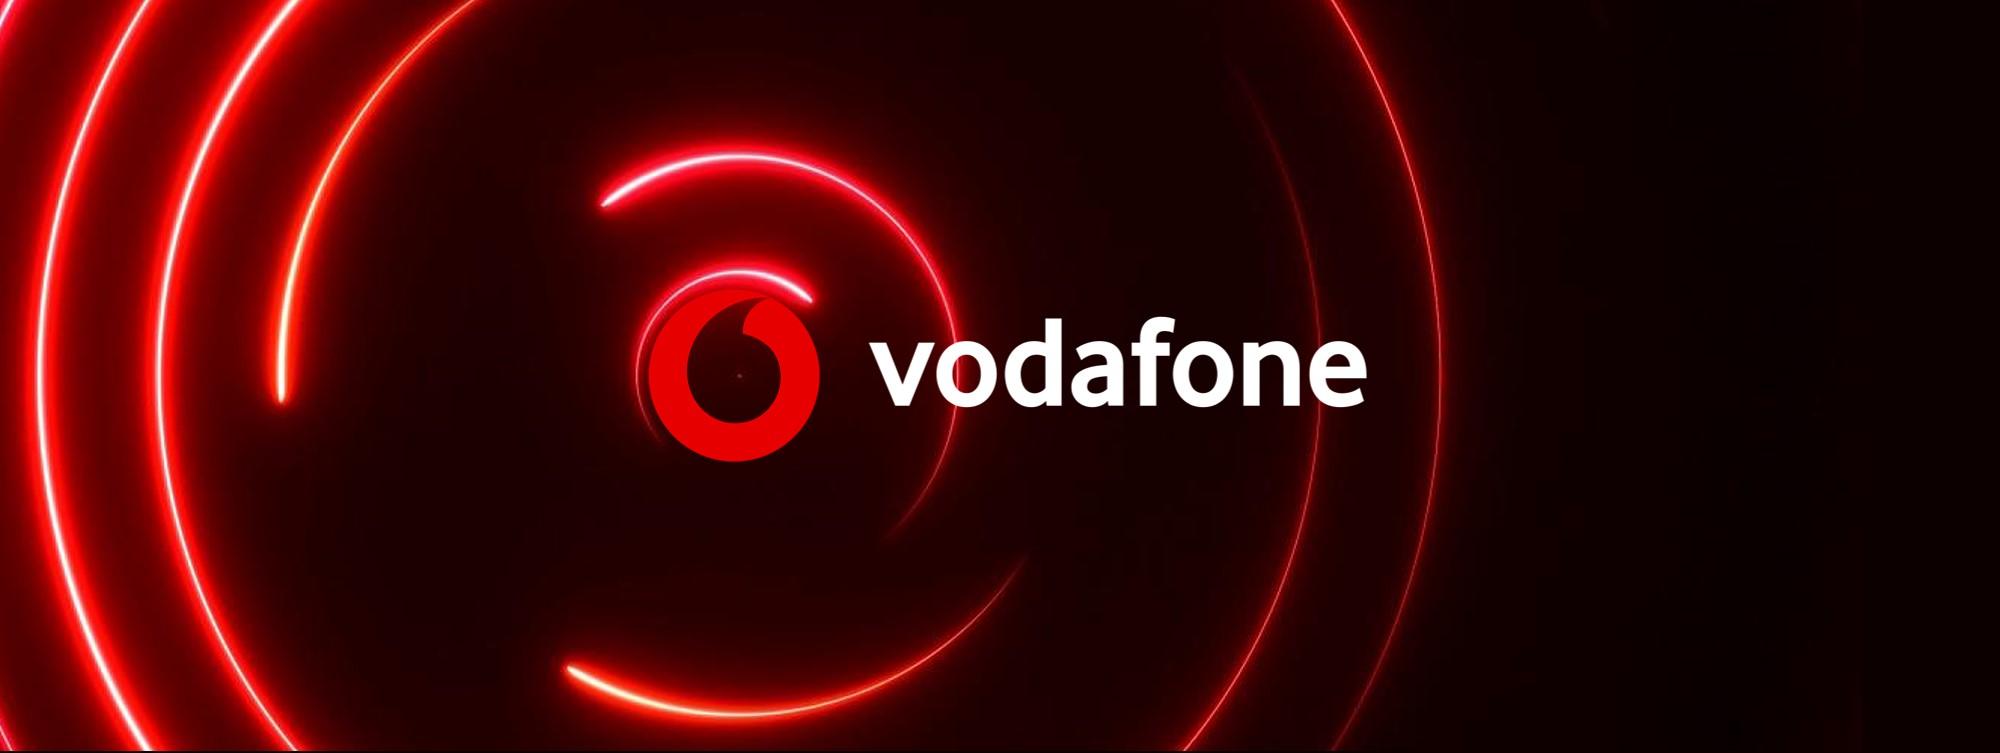 vodafone-agf-test-pr-banner-featured-image